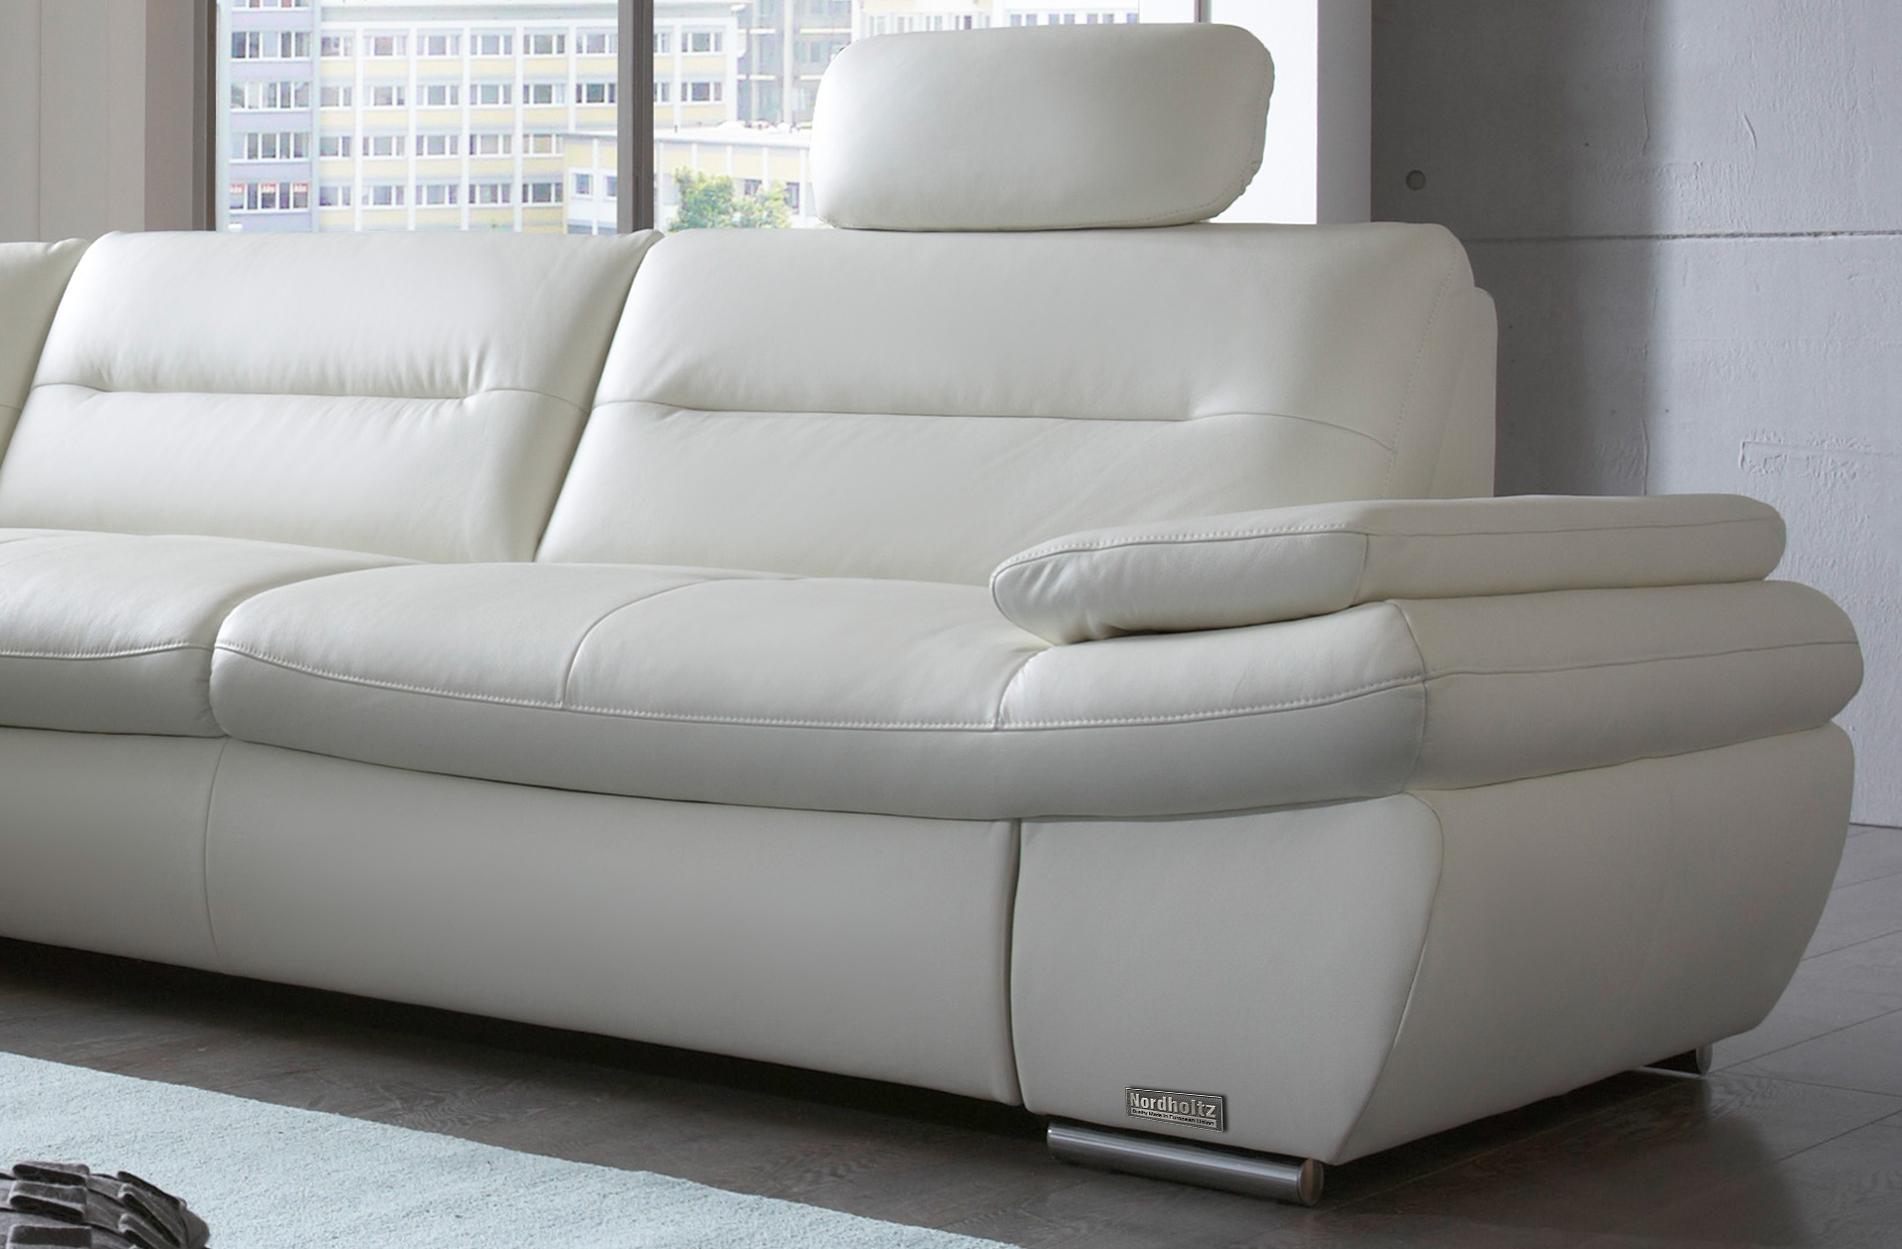 Surprising Alpine Sectional Sofa 9 Nordholtz Furniture Short Links Chair Design For Home Short Linksinfo